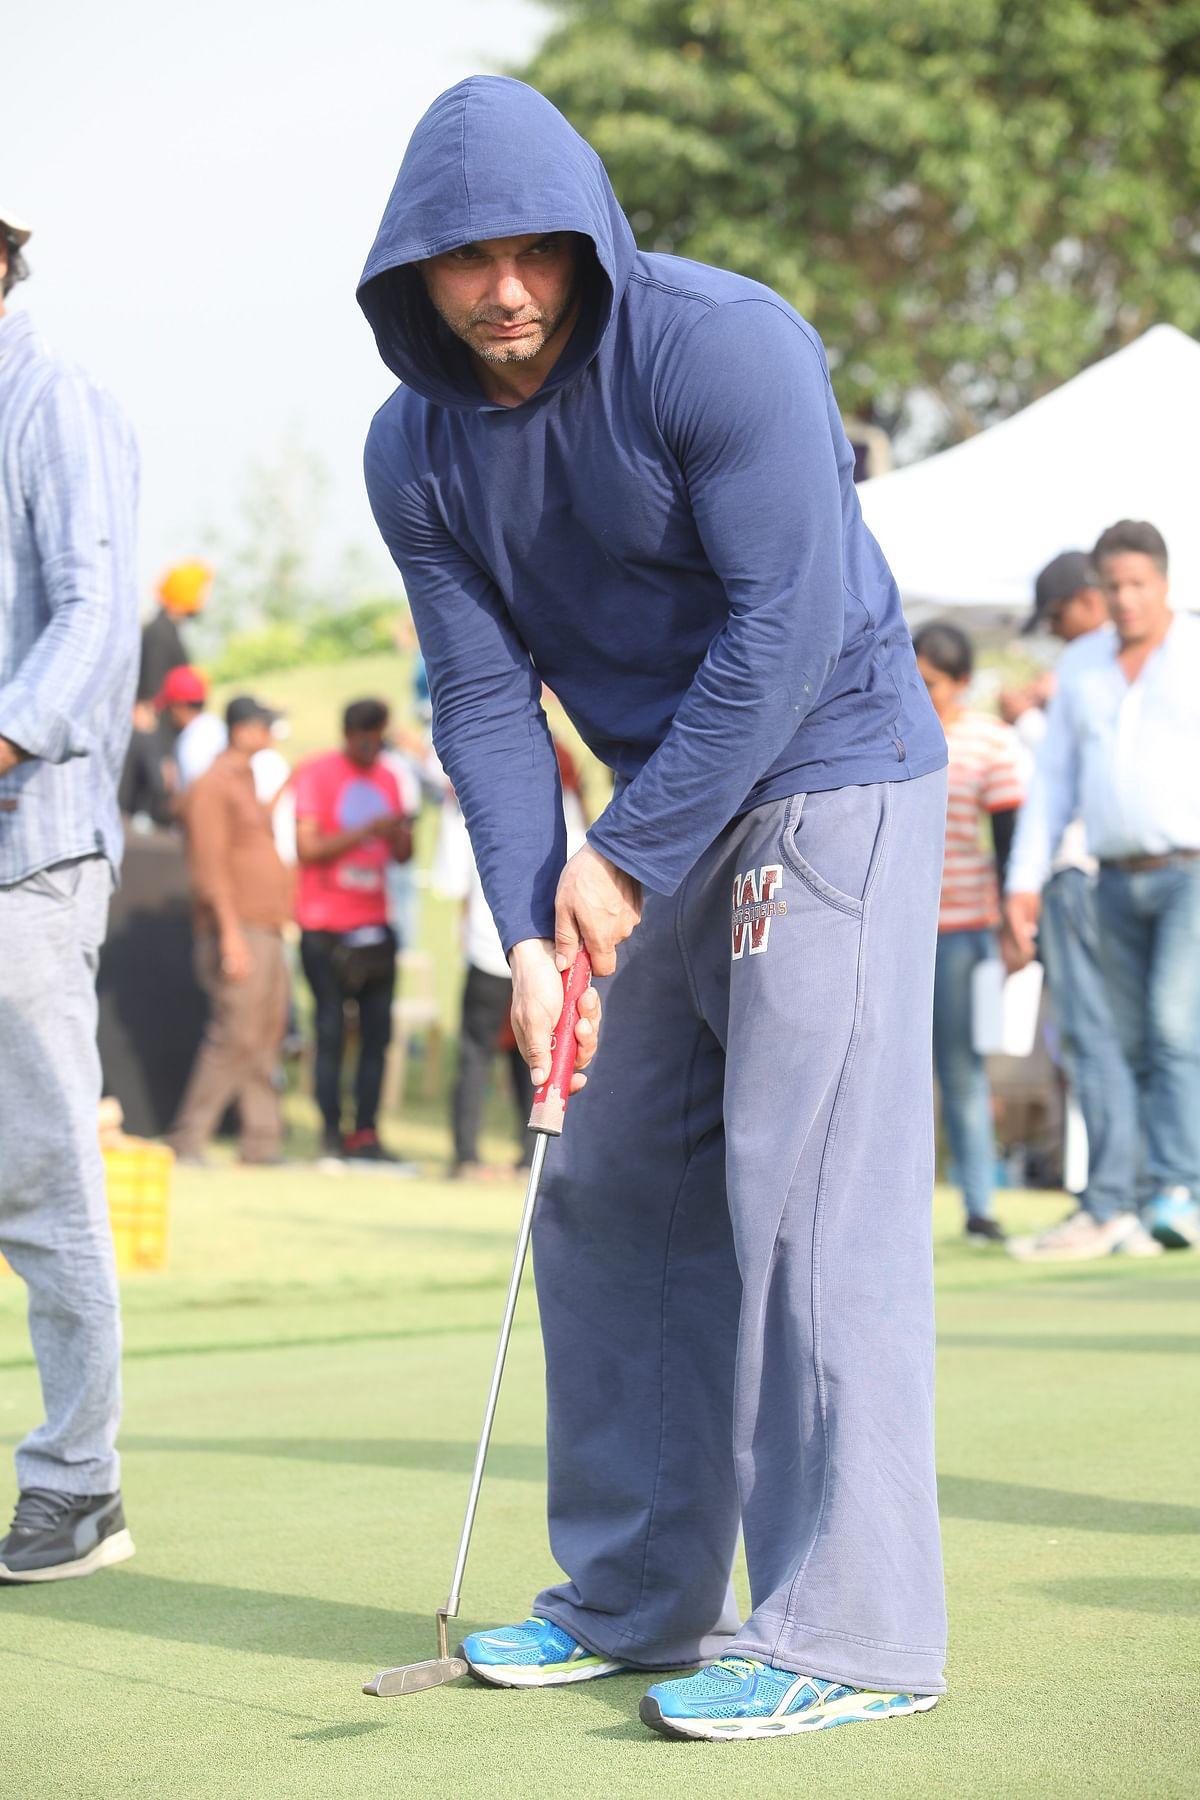 Sohail enjoys a game of golf. (Photo Courtesy: Sohail Khan Productions)